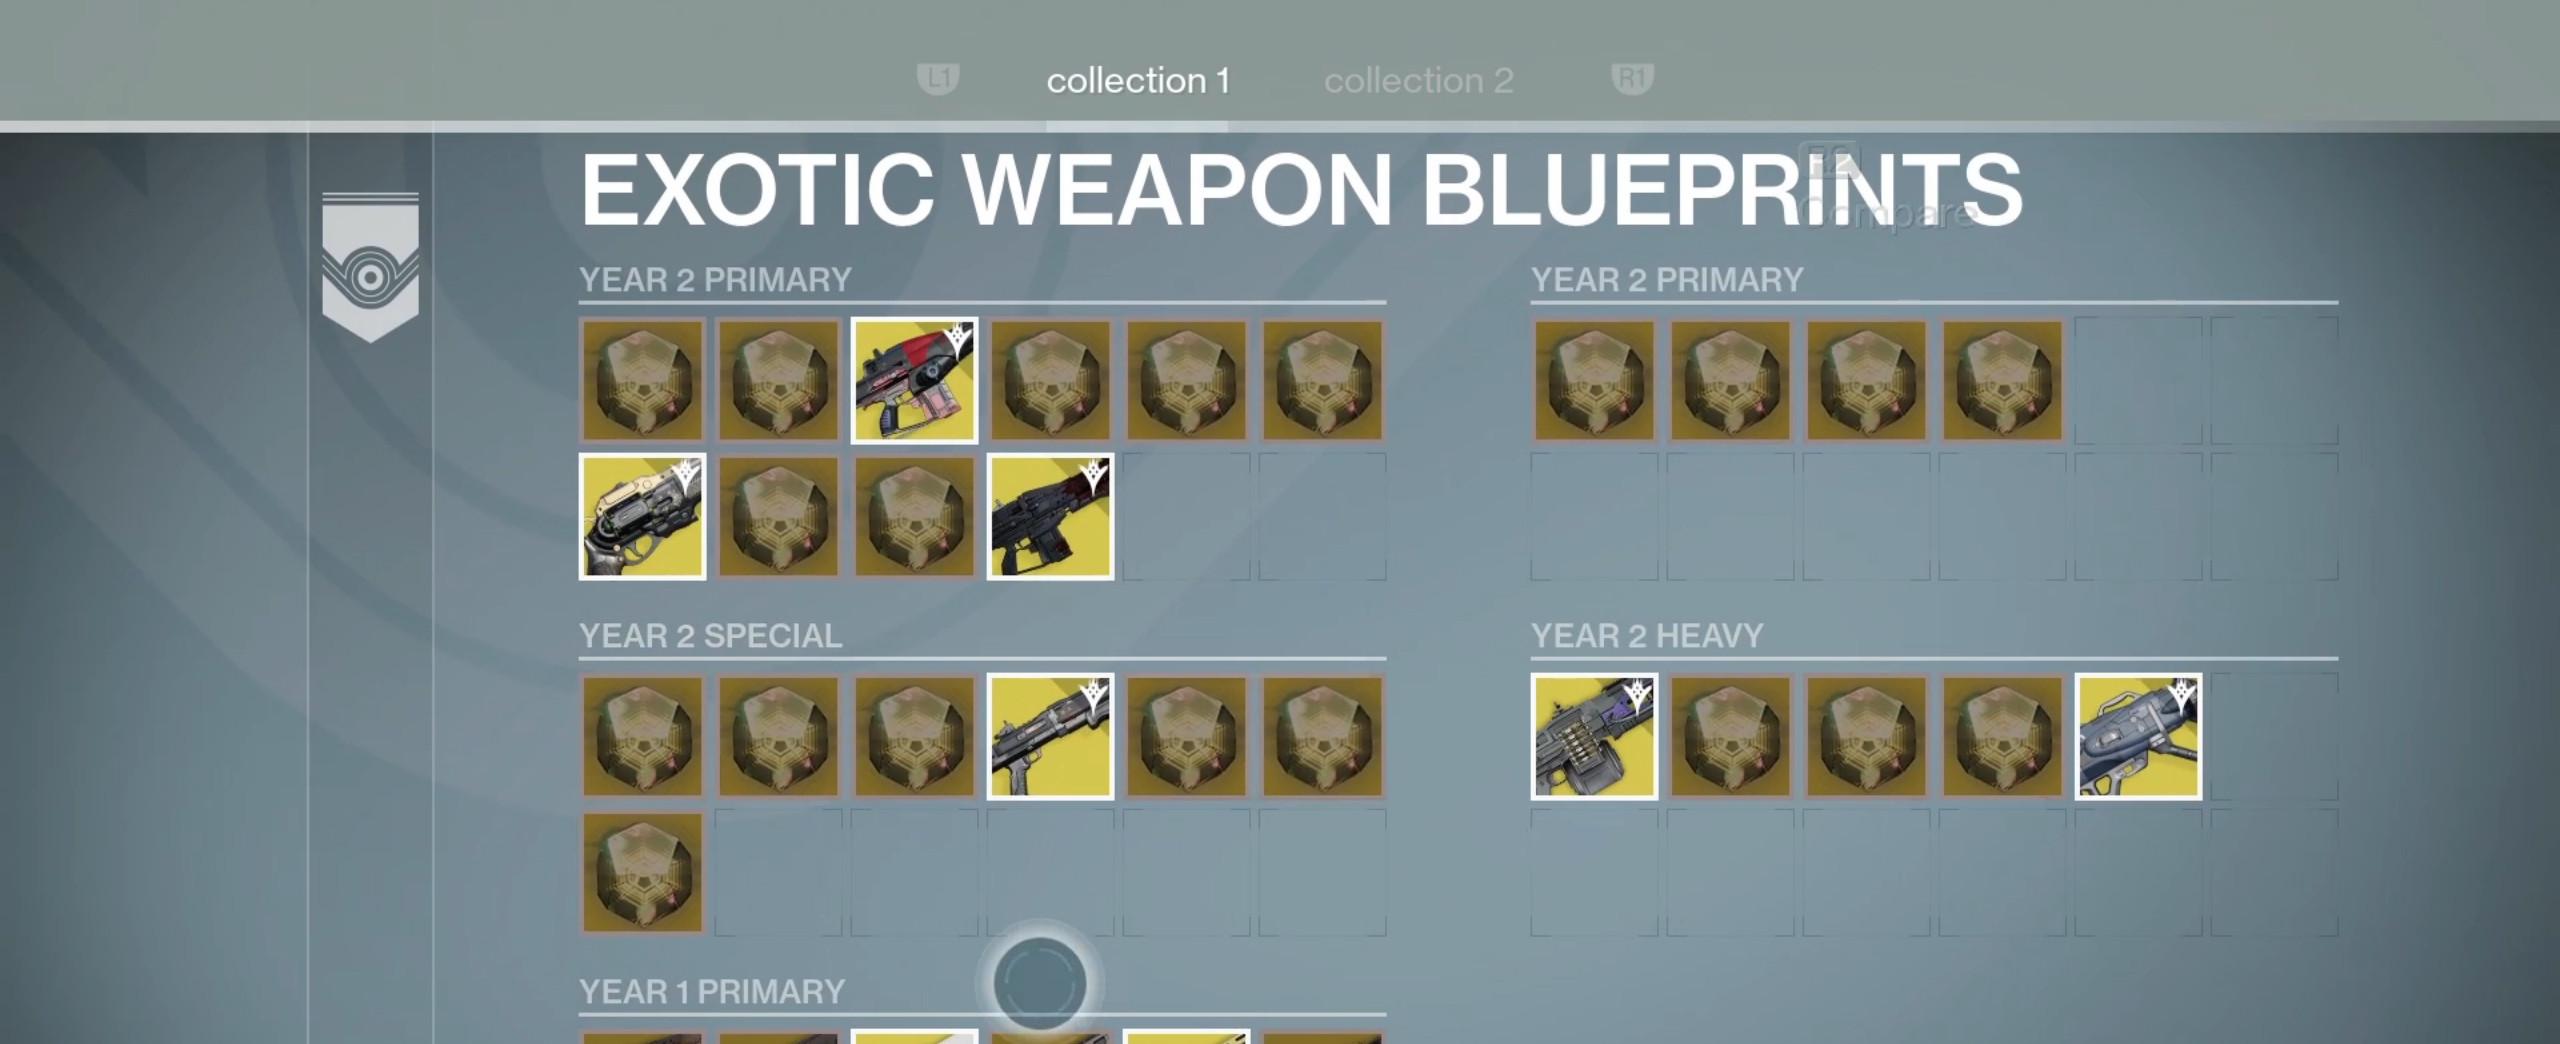 Destiny page 50 gaming gtaforums screenshot2015 08 19at41239pm0p malvernweather Images